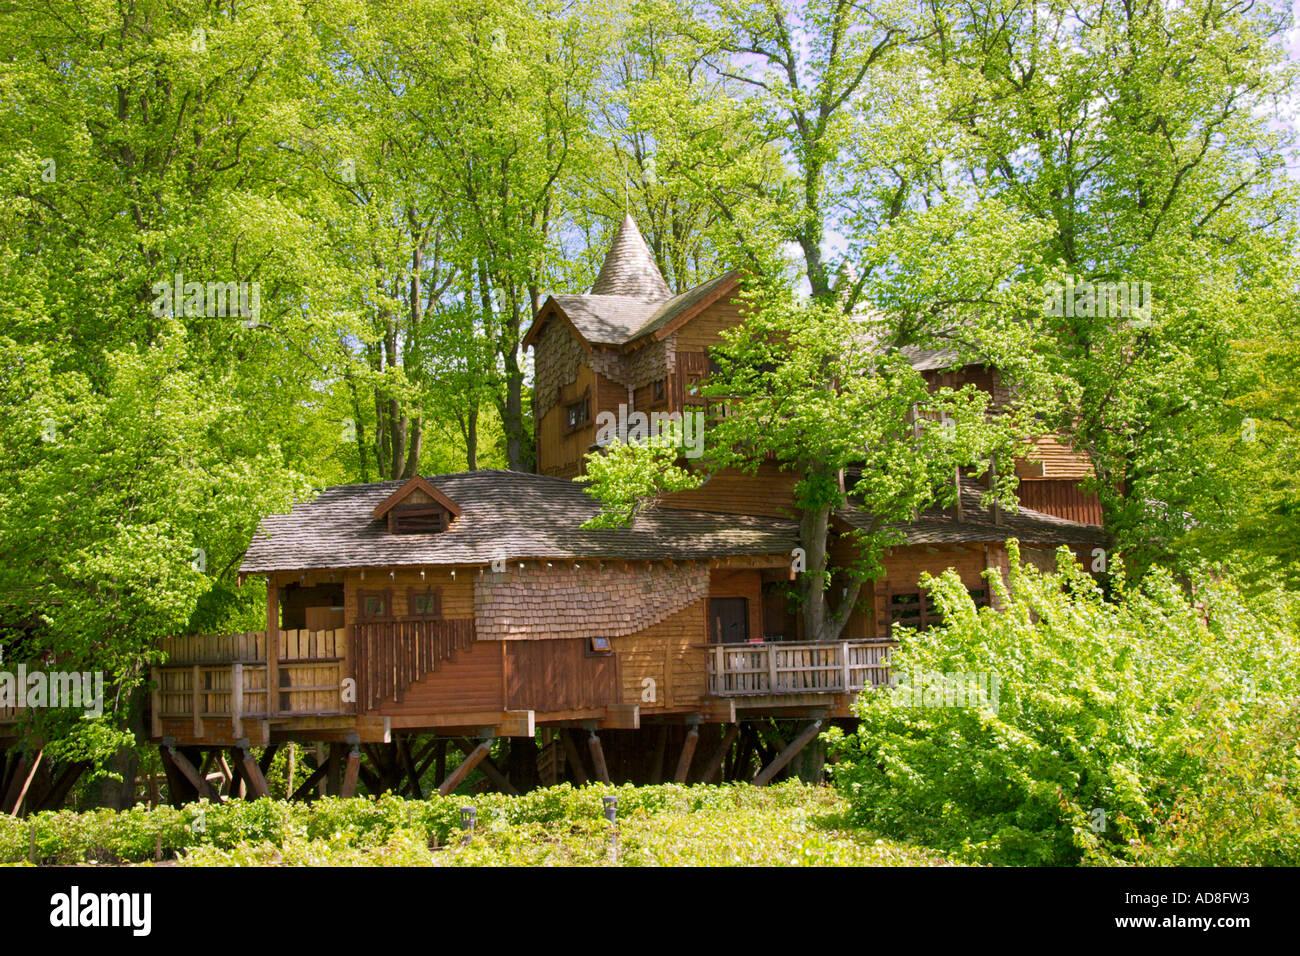 Maison de l'arbre au jardin d'Alnwick Northumberland Royaume-uni Photo Stock